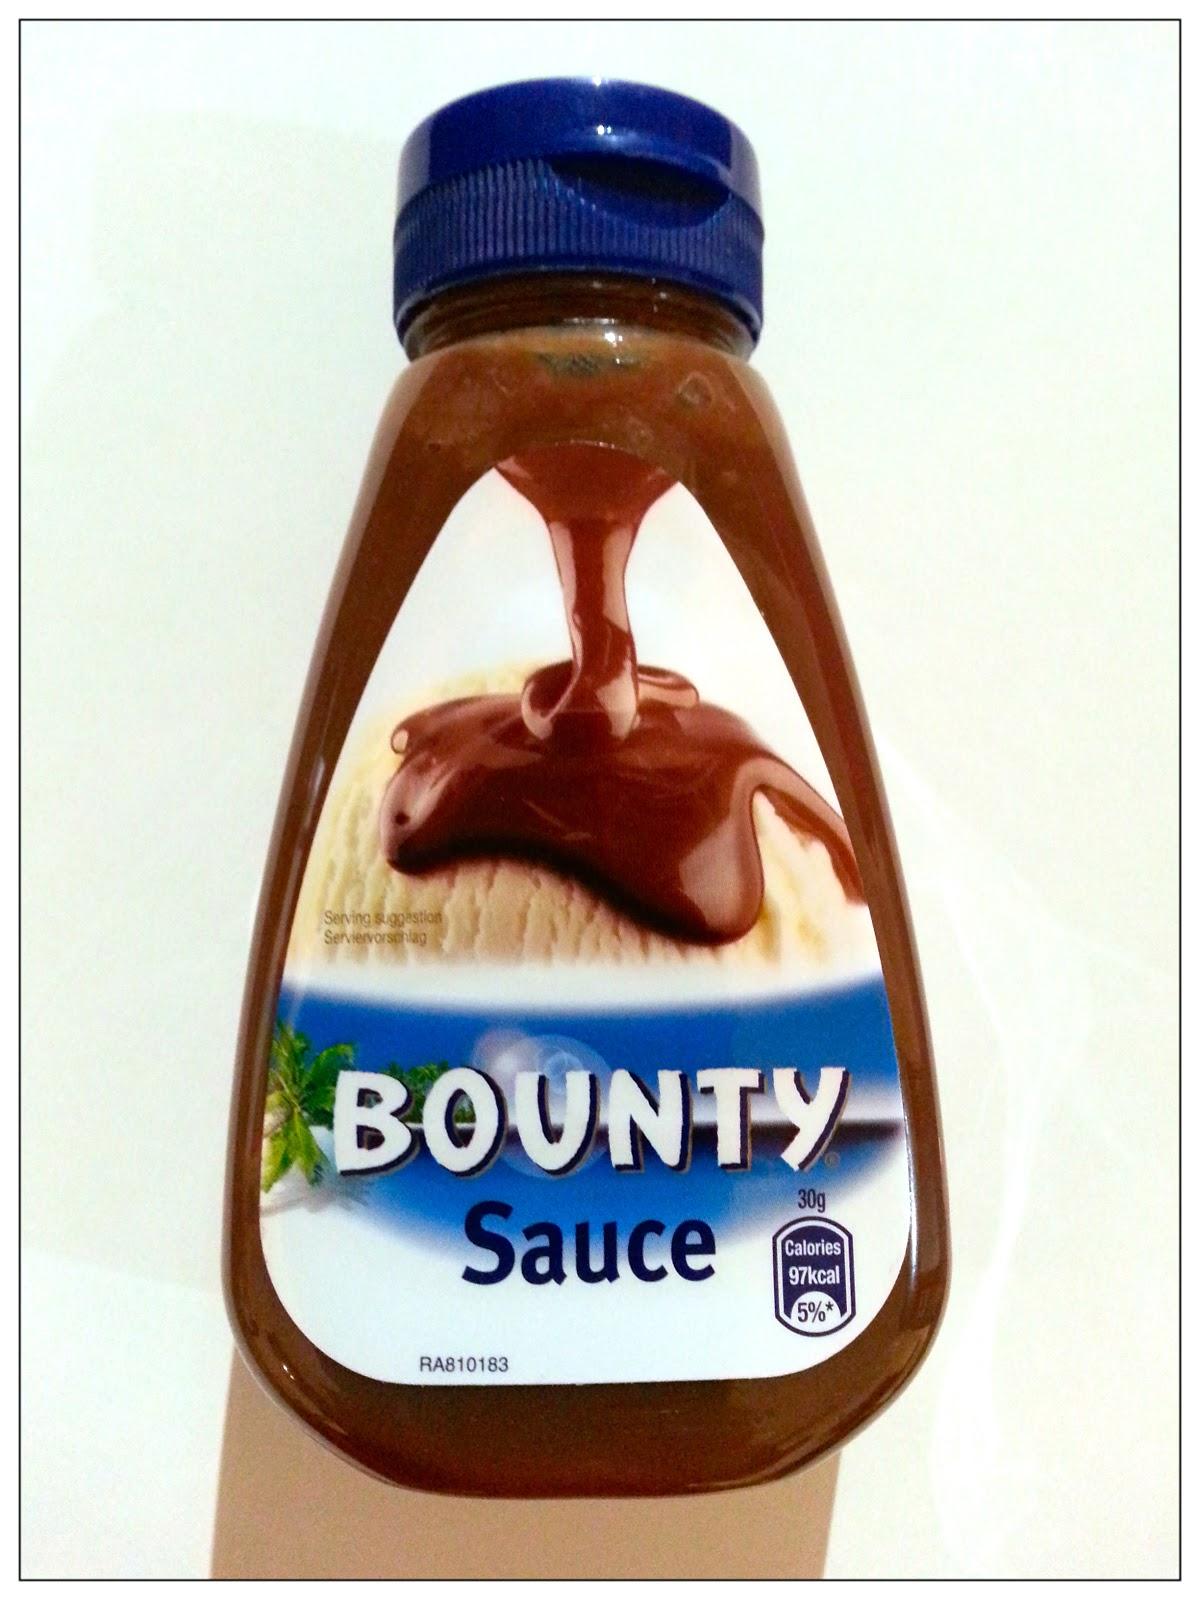 Bounty+Sauce.jpg